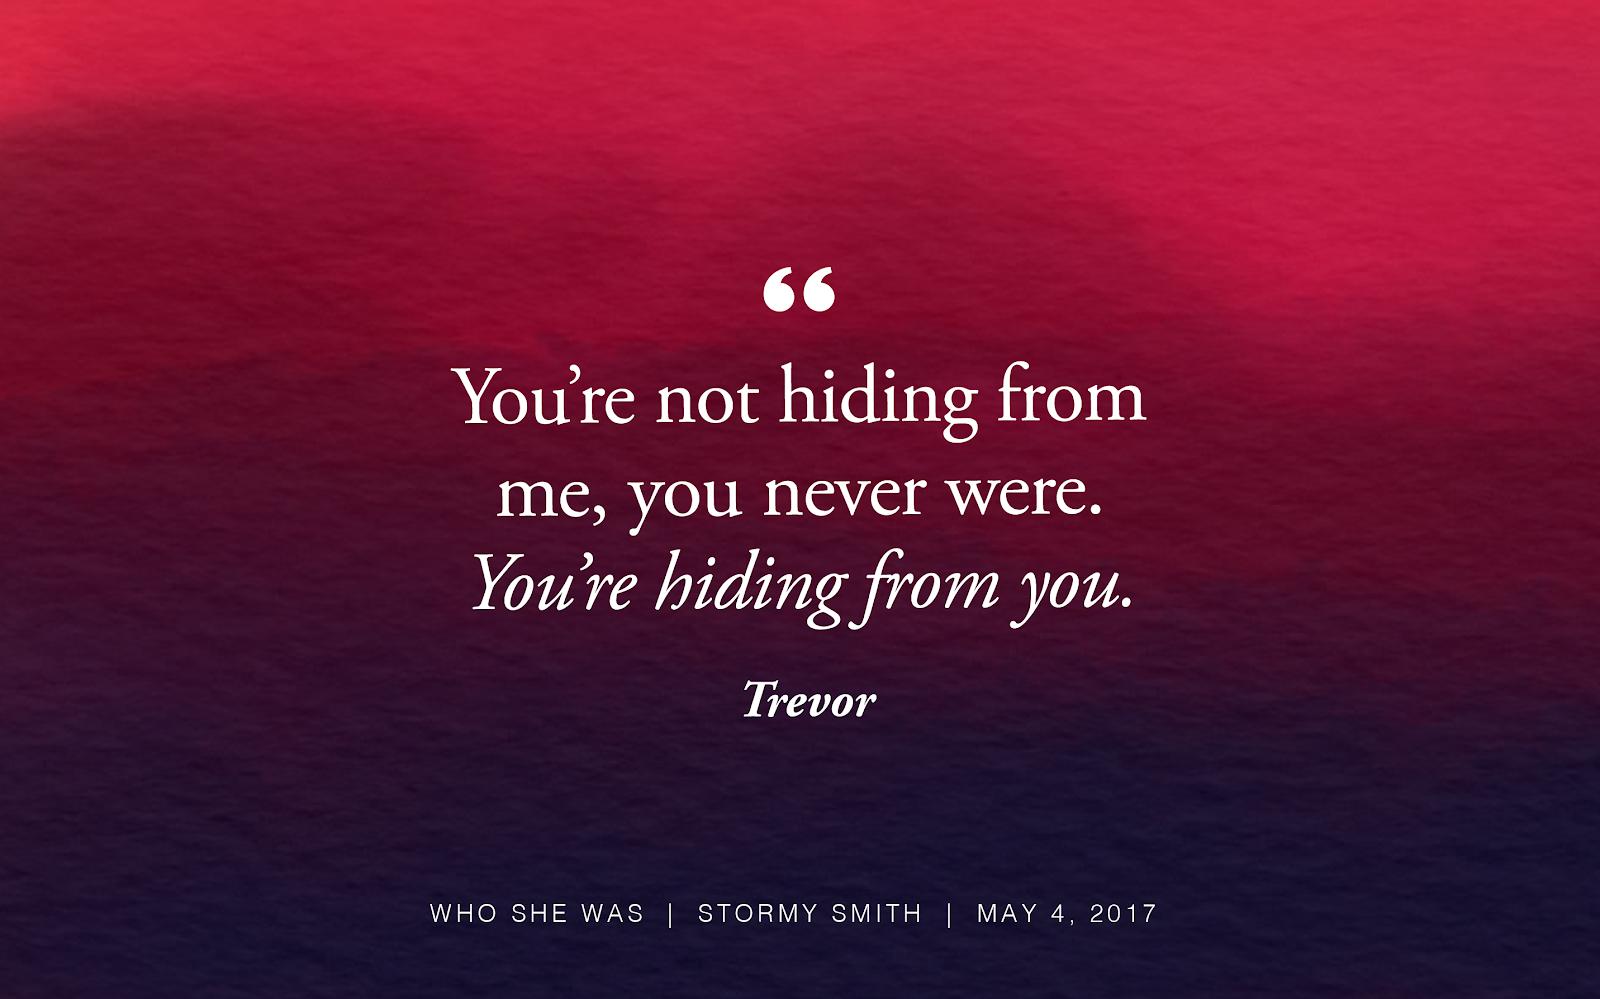 WSW_StormySmith_Hiding_TW.png